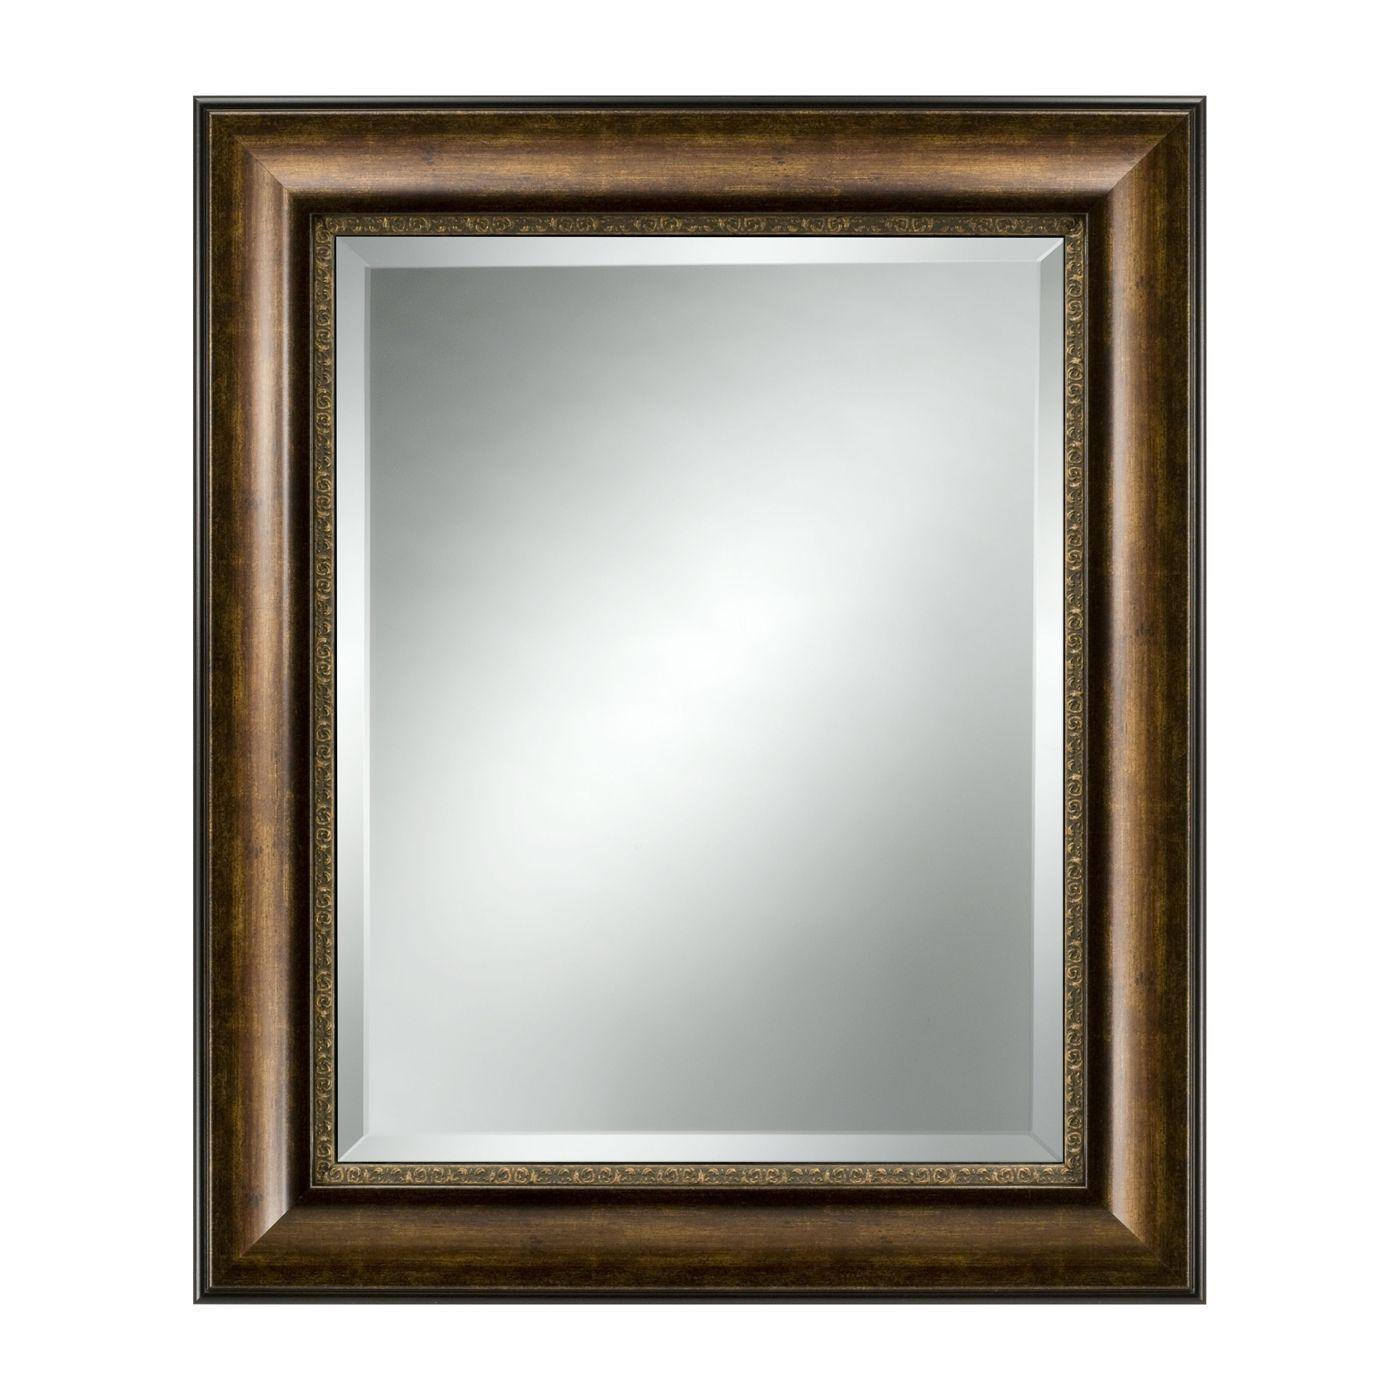 The Ashton Company Wall Mirror   Framed Mirrors   Pinterest   Frame ...